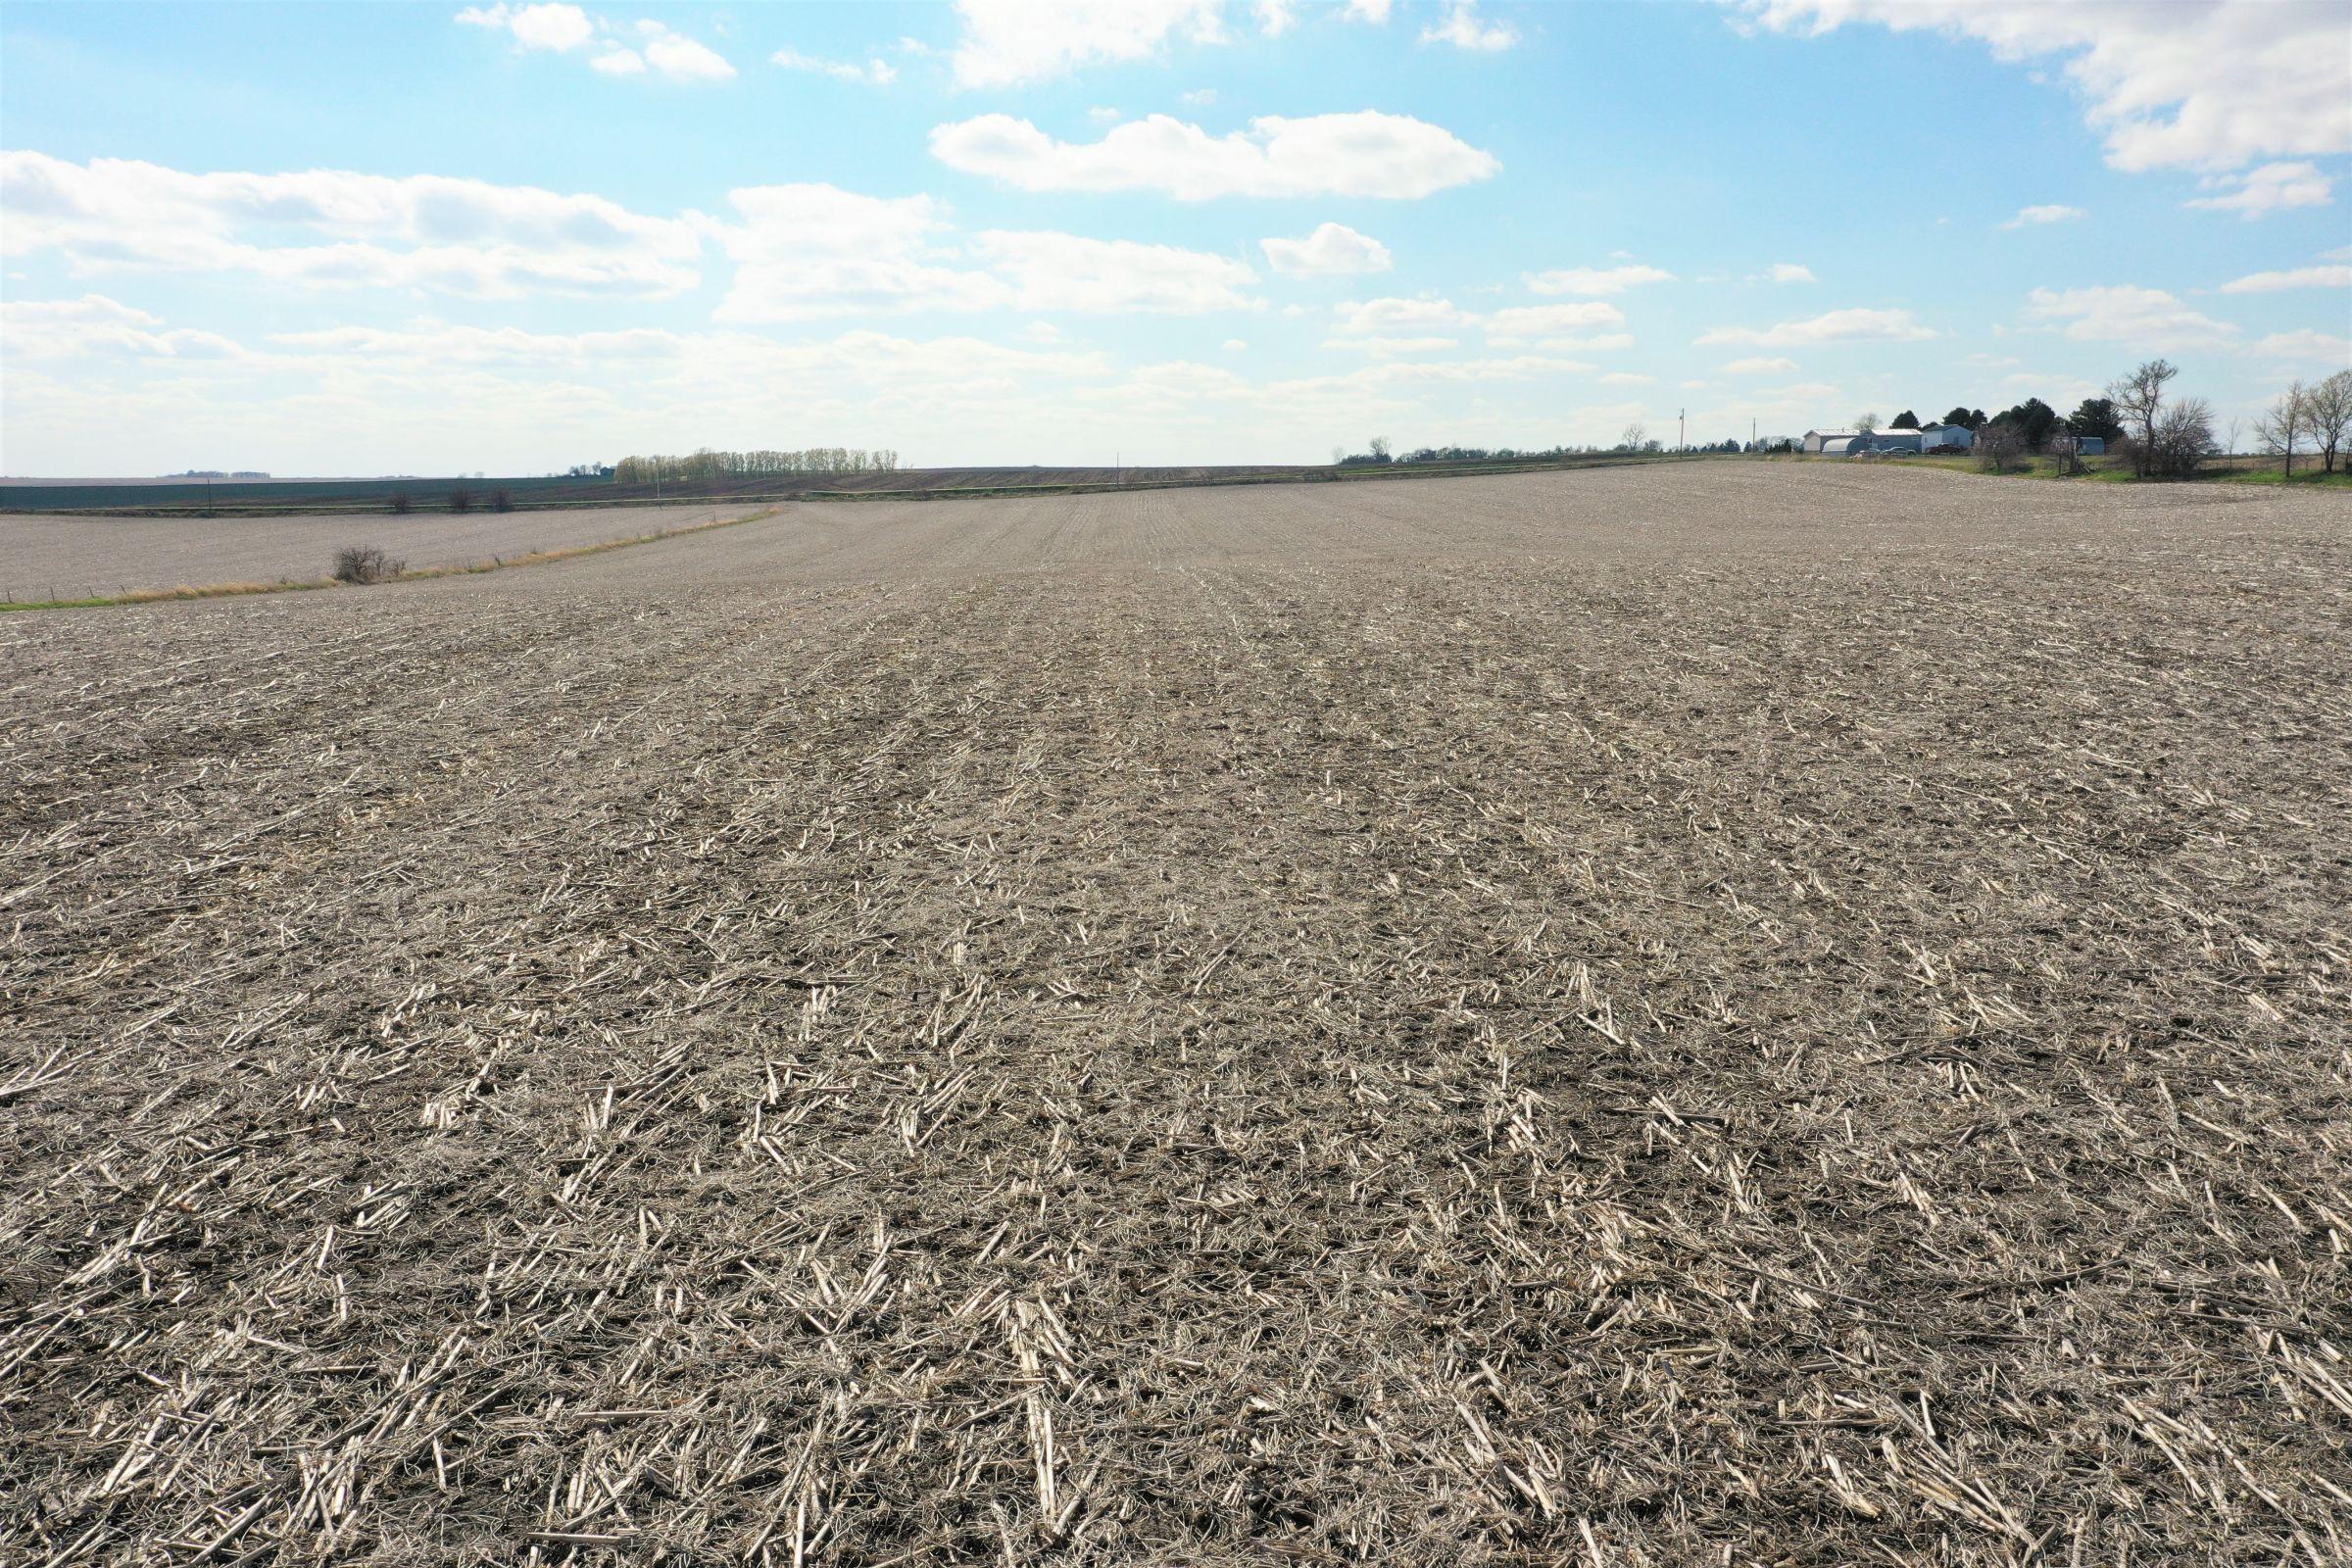 floyd-county-iowa-80-acres-listing-number-15486-1-2021-04-26-003051.JPG